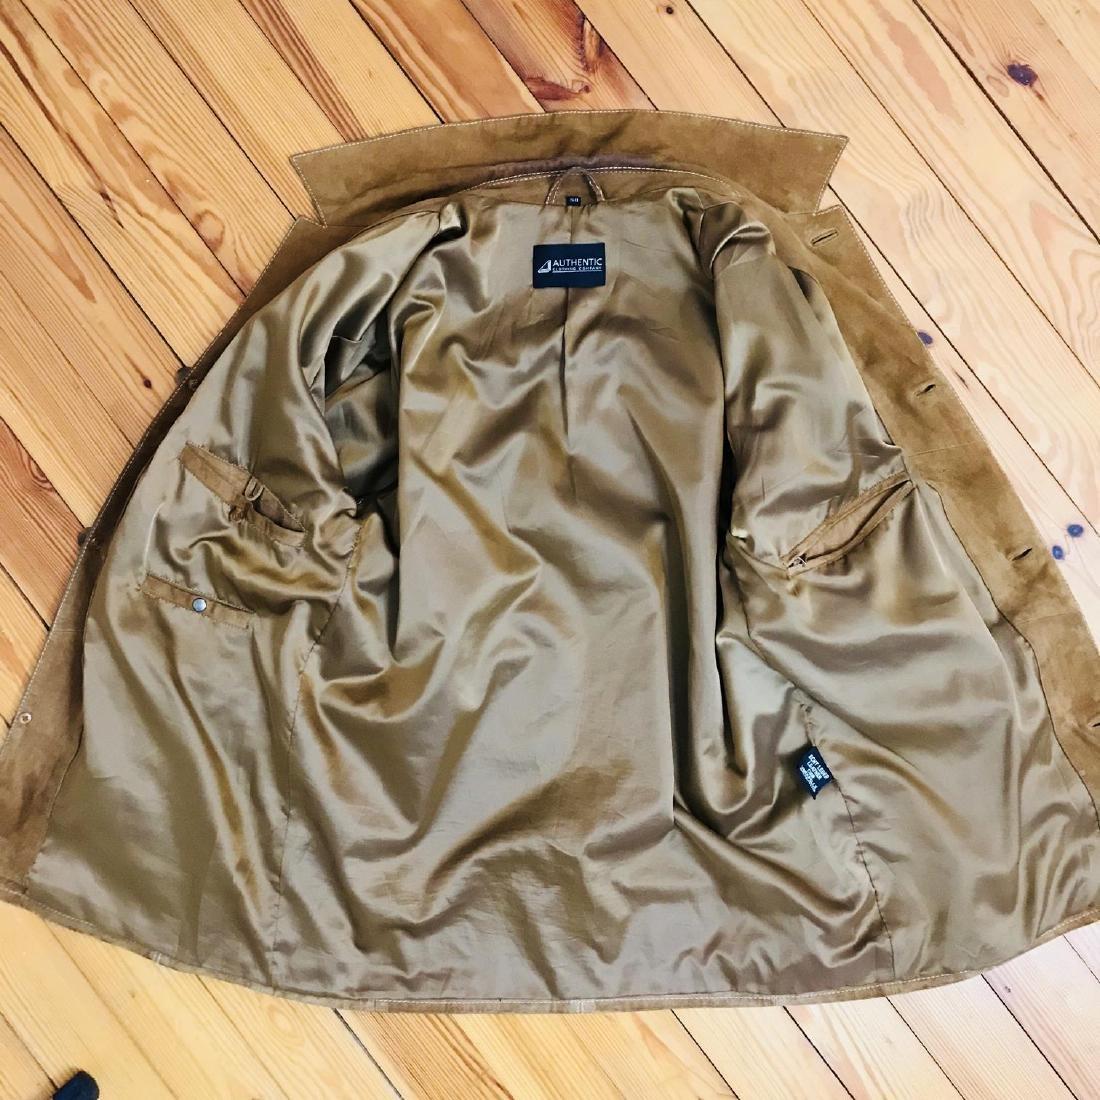 Vintage Men's Brown Suede Leather Jacket Coat Size 40 - 6